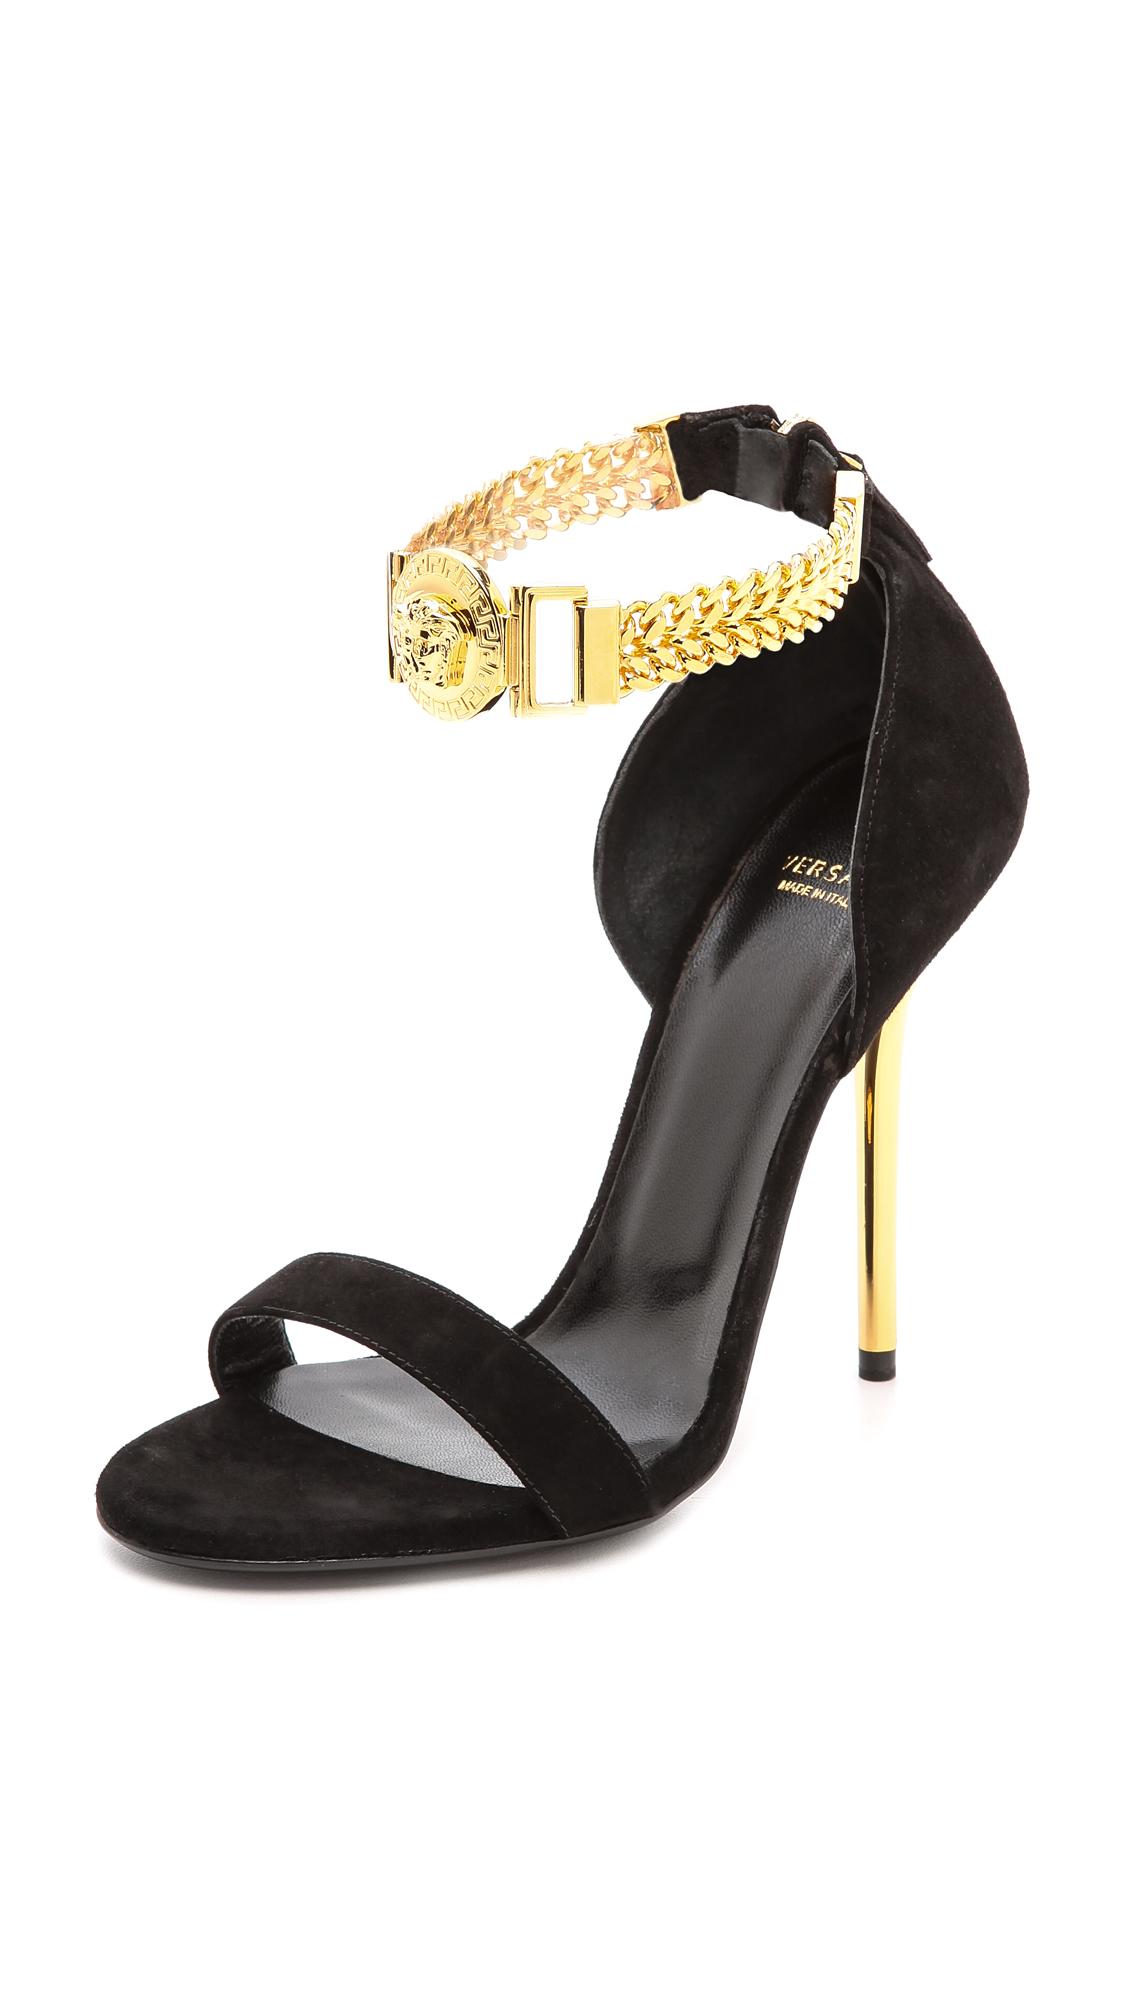 84e6367fce Versace Embellished Black Suede Ankle Strap Sandals | ModeSens